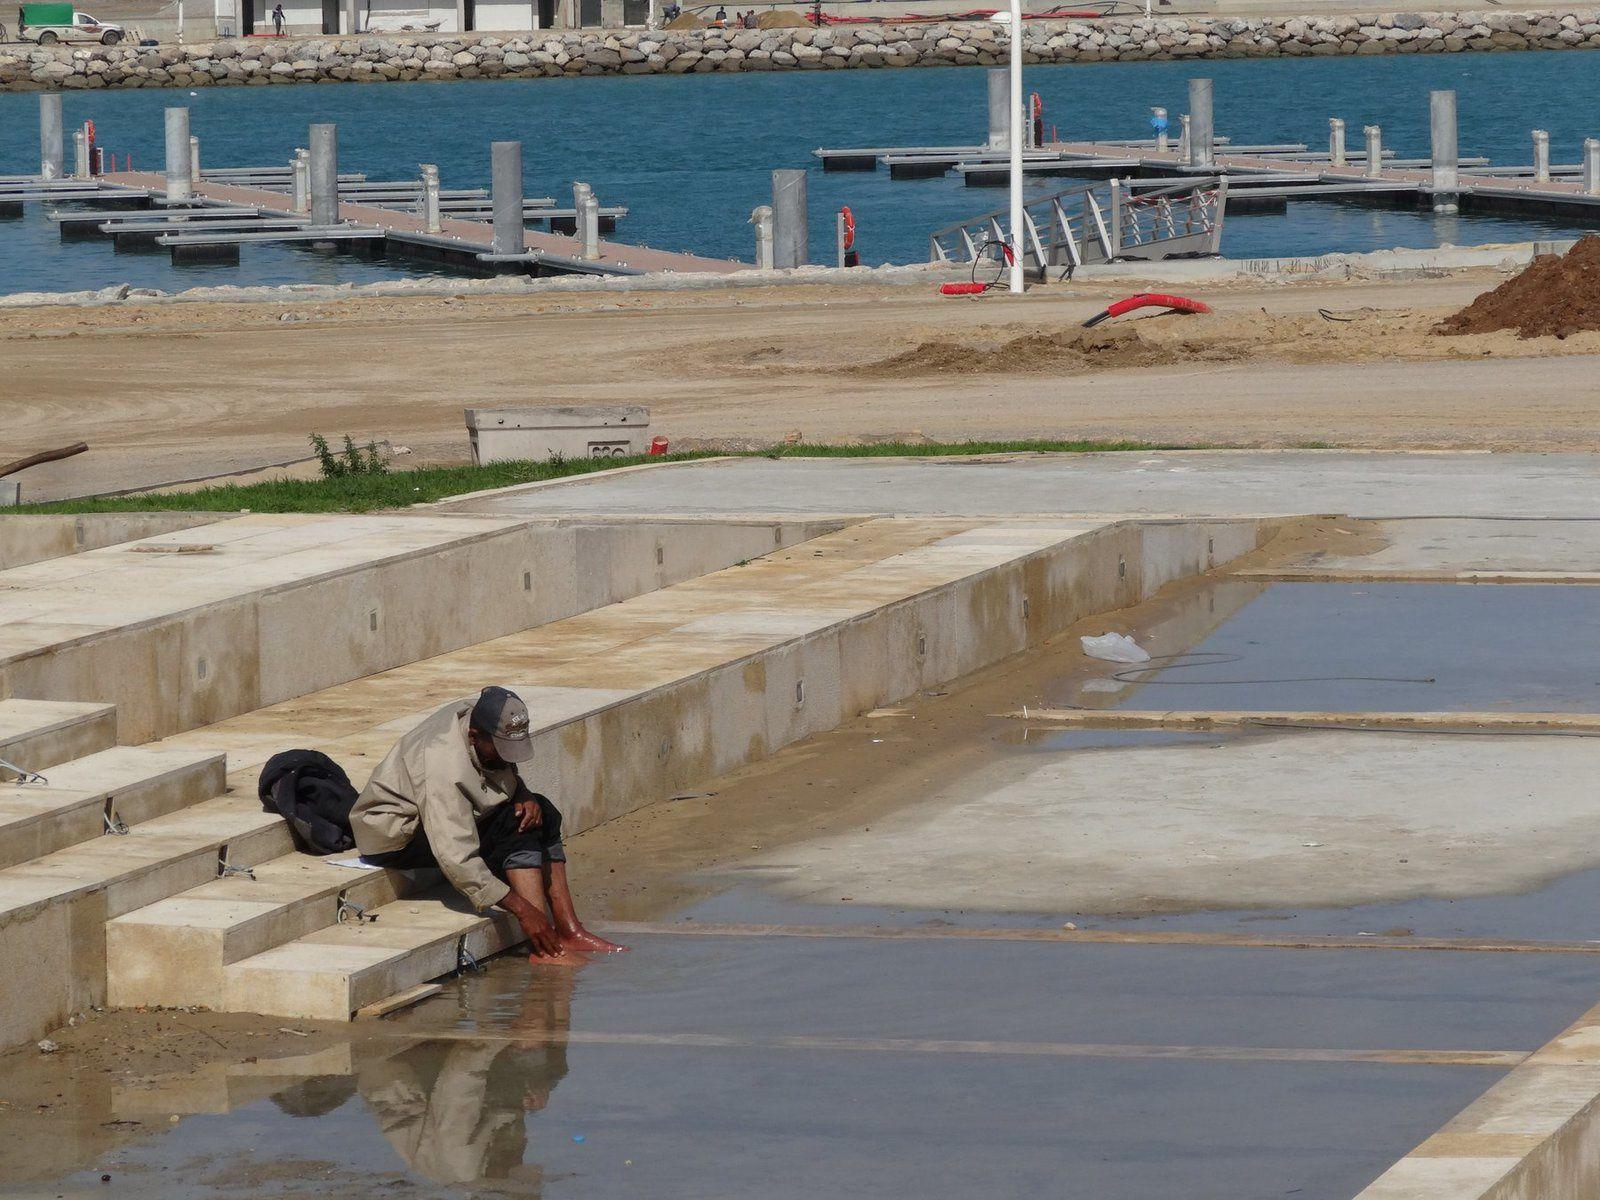 Image de Tanger